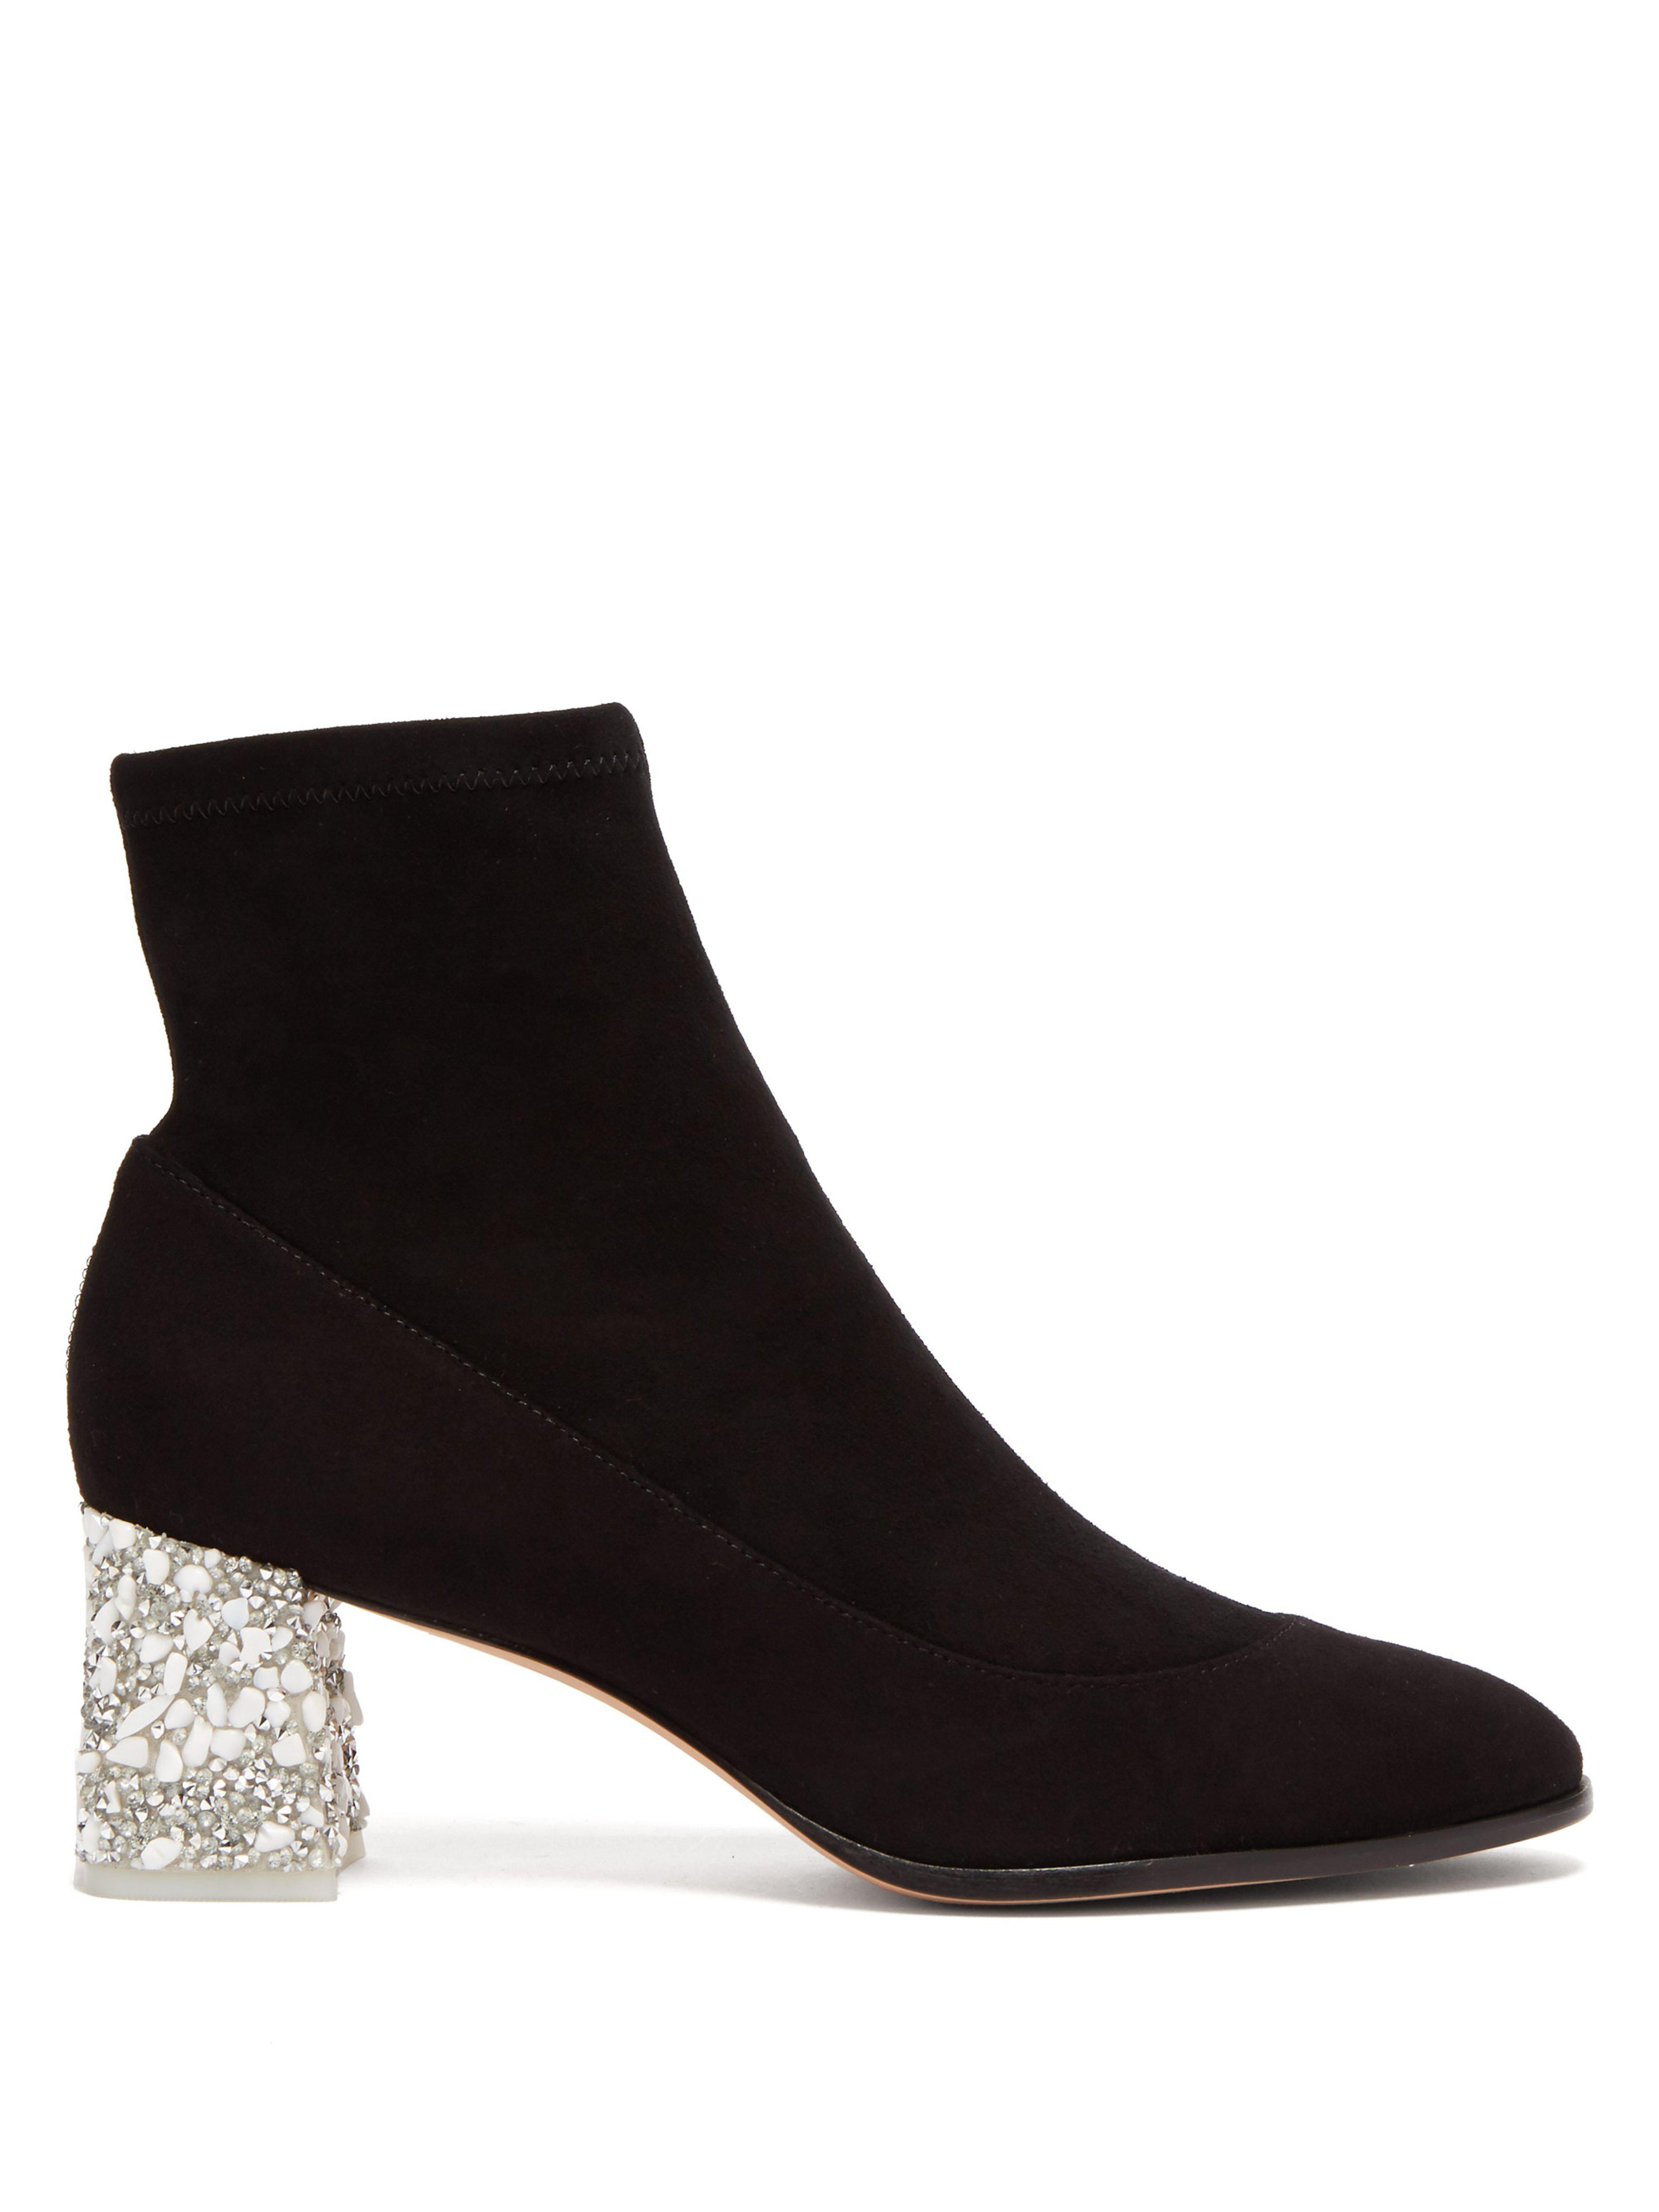 Sophia Webster Suede Ankle Boots in Black